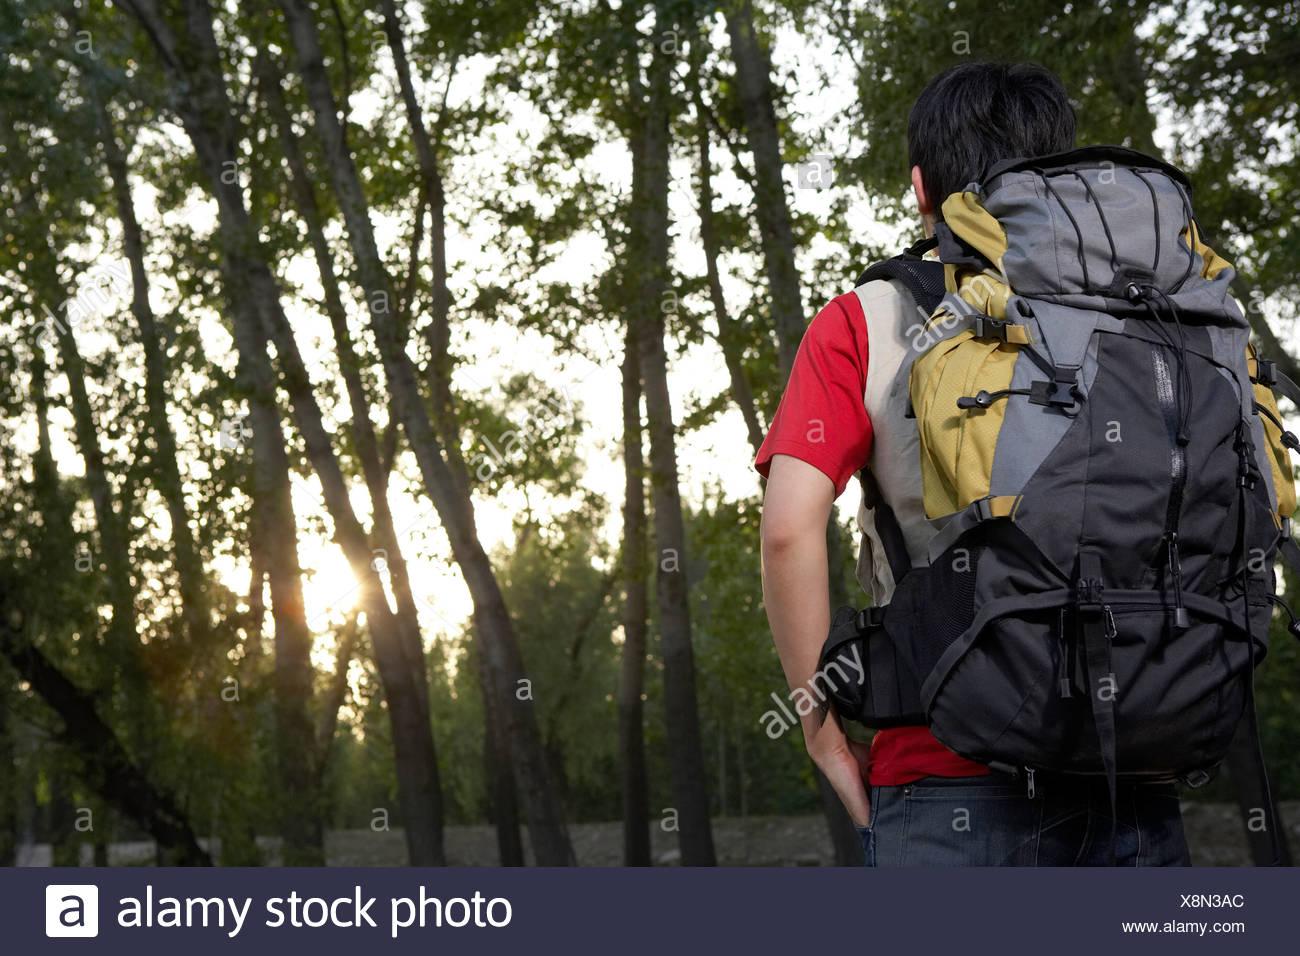 Young Man Walking Through Trees - Stock Image